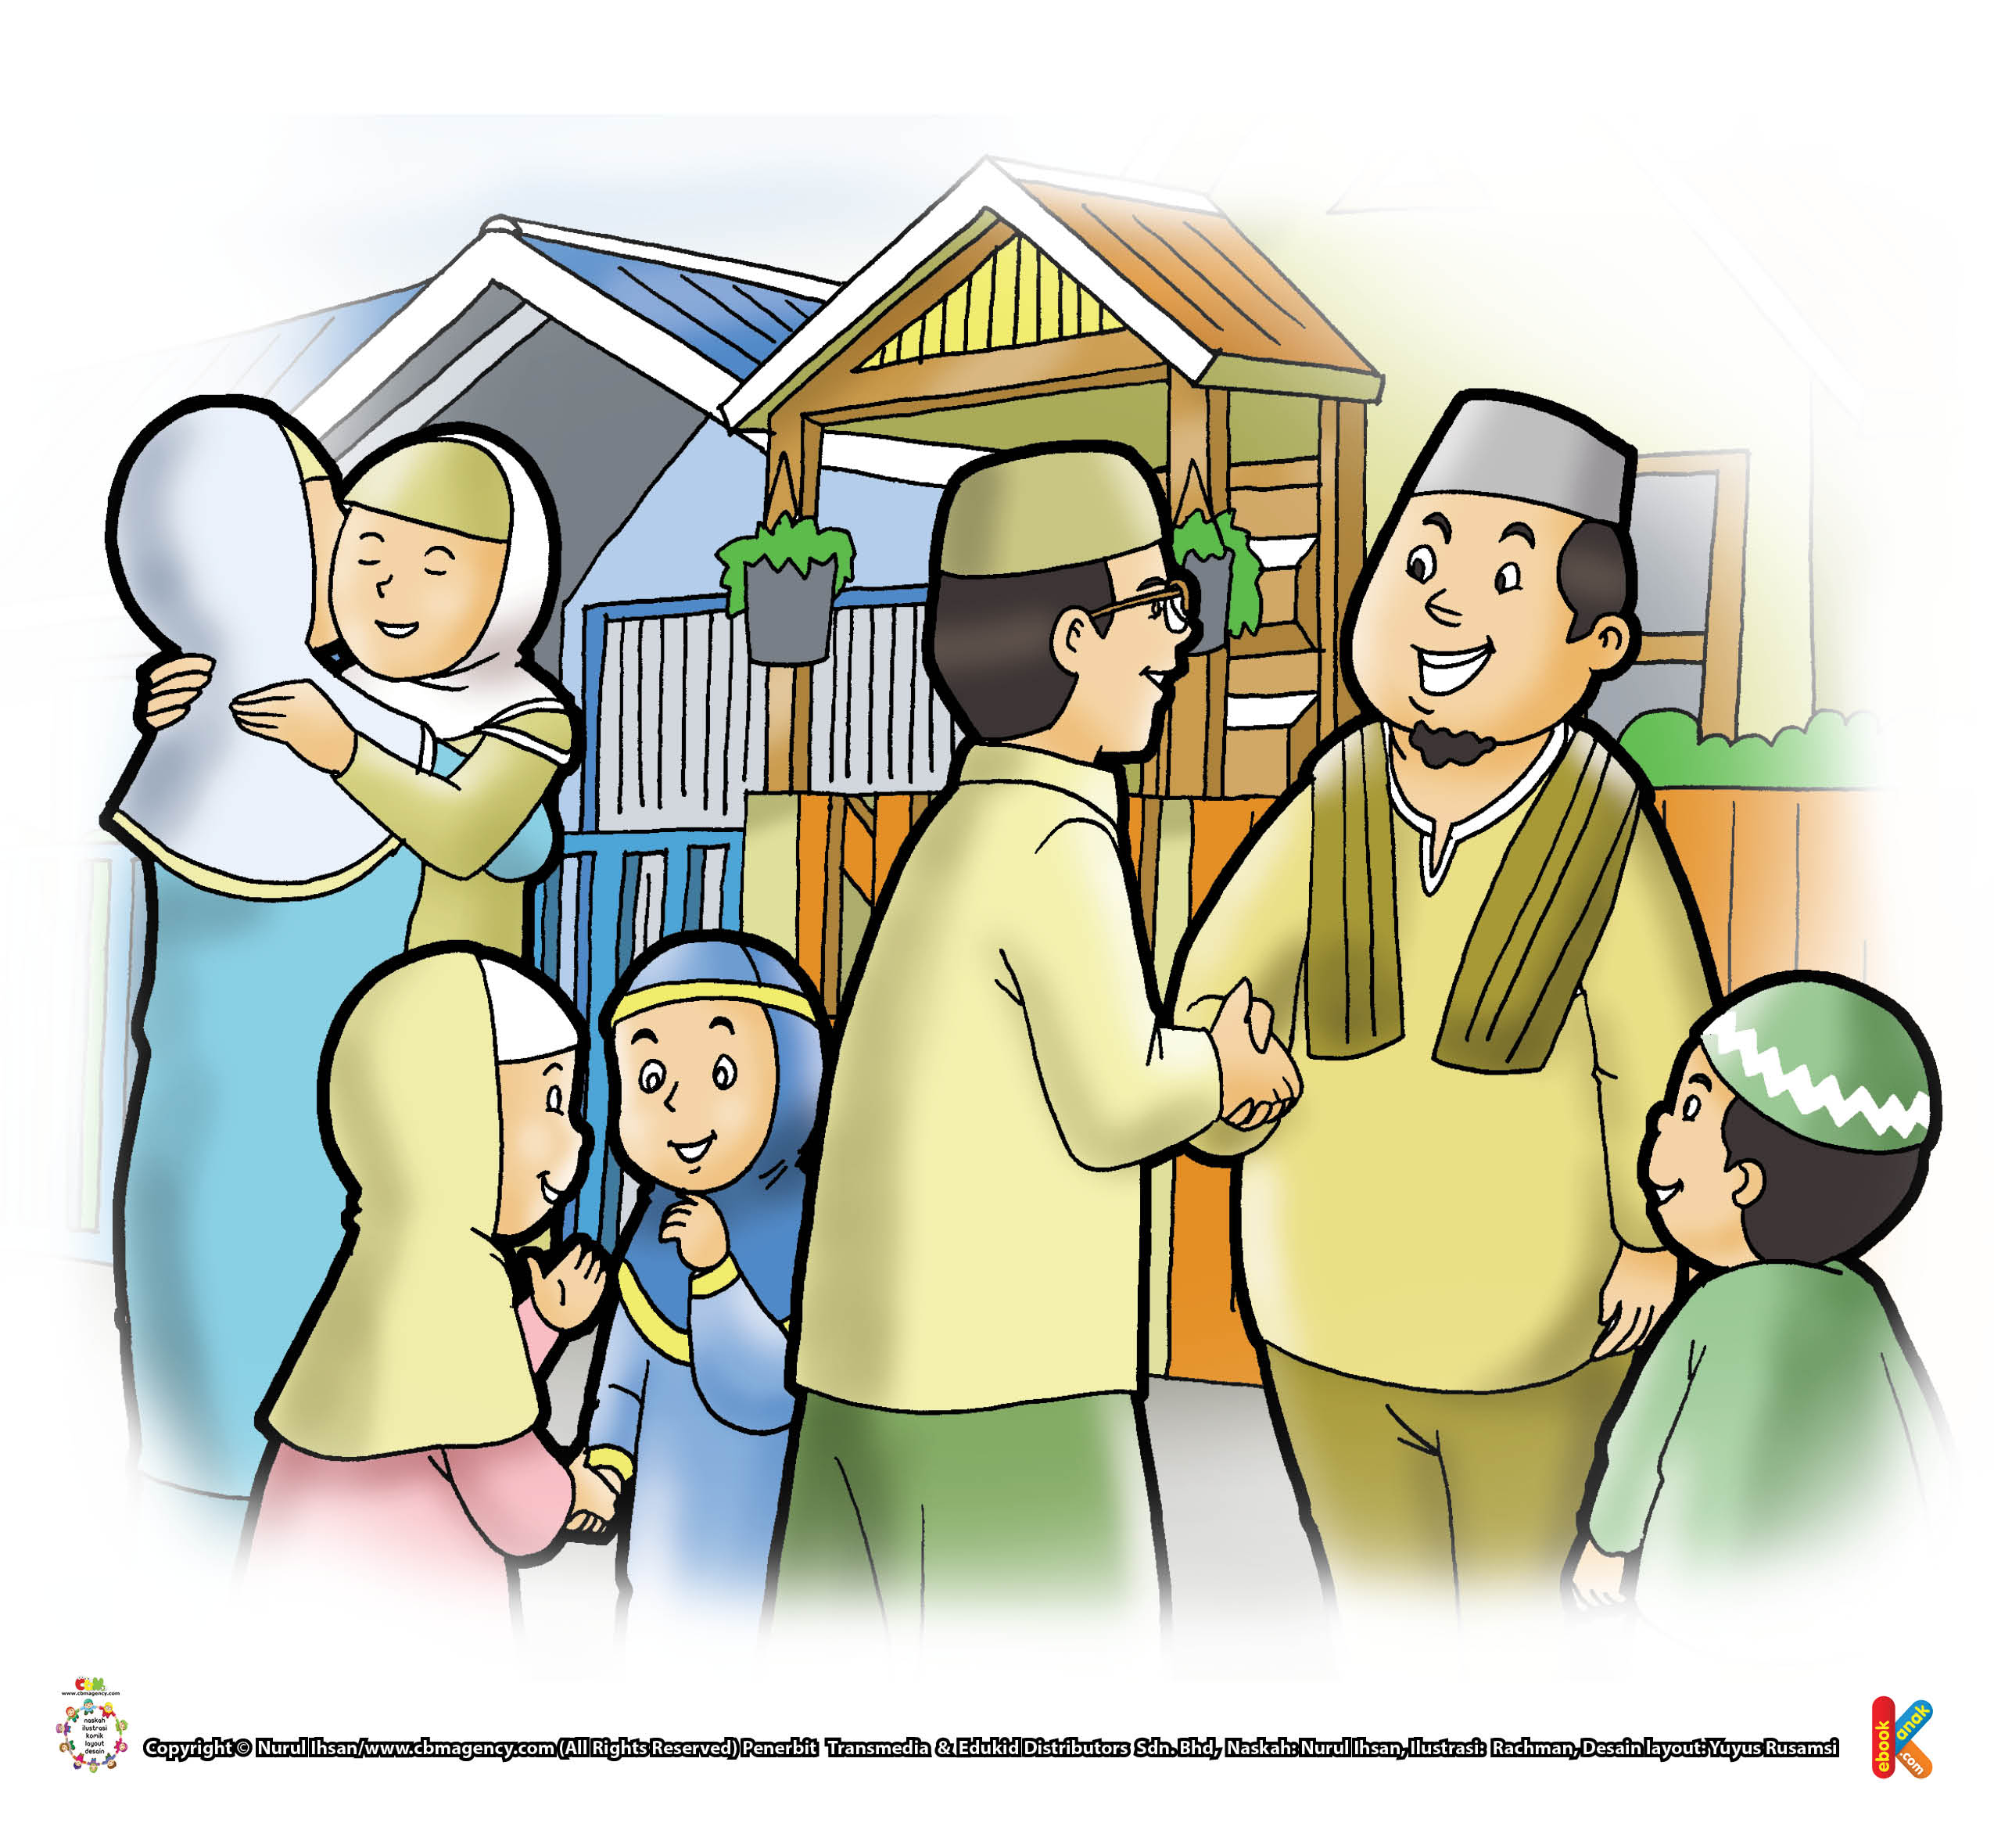 Selamat Hari Raya Idul Fitri: Takbiran Hari Raya Idul Fitri